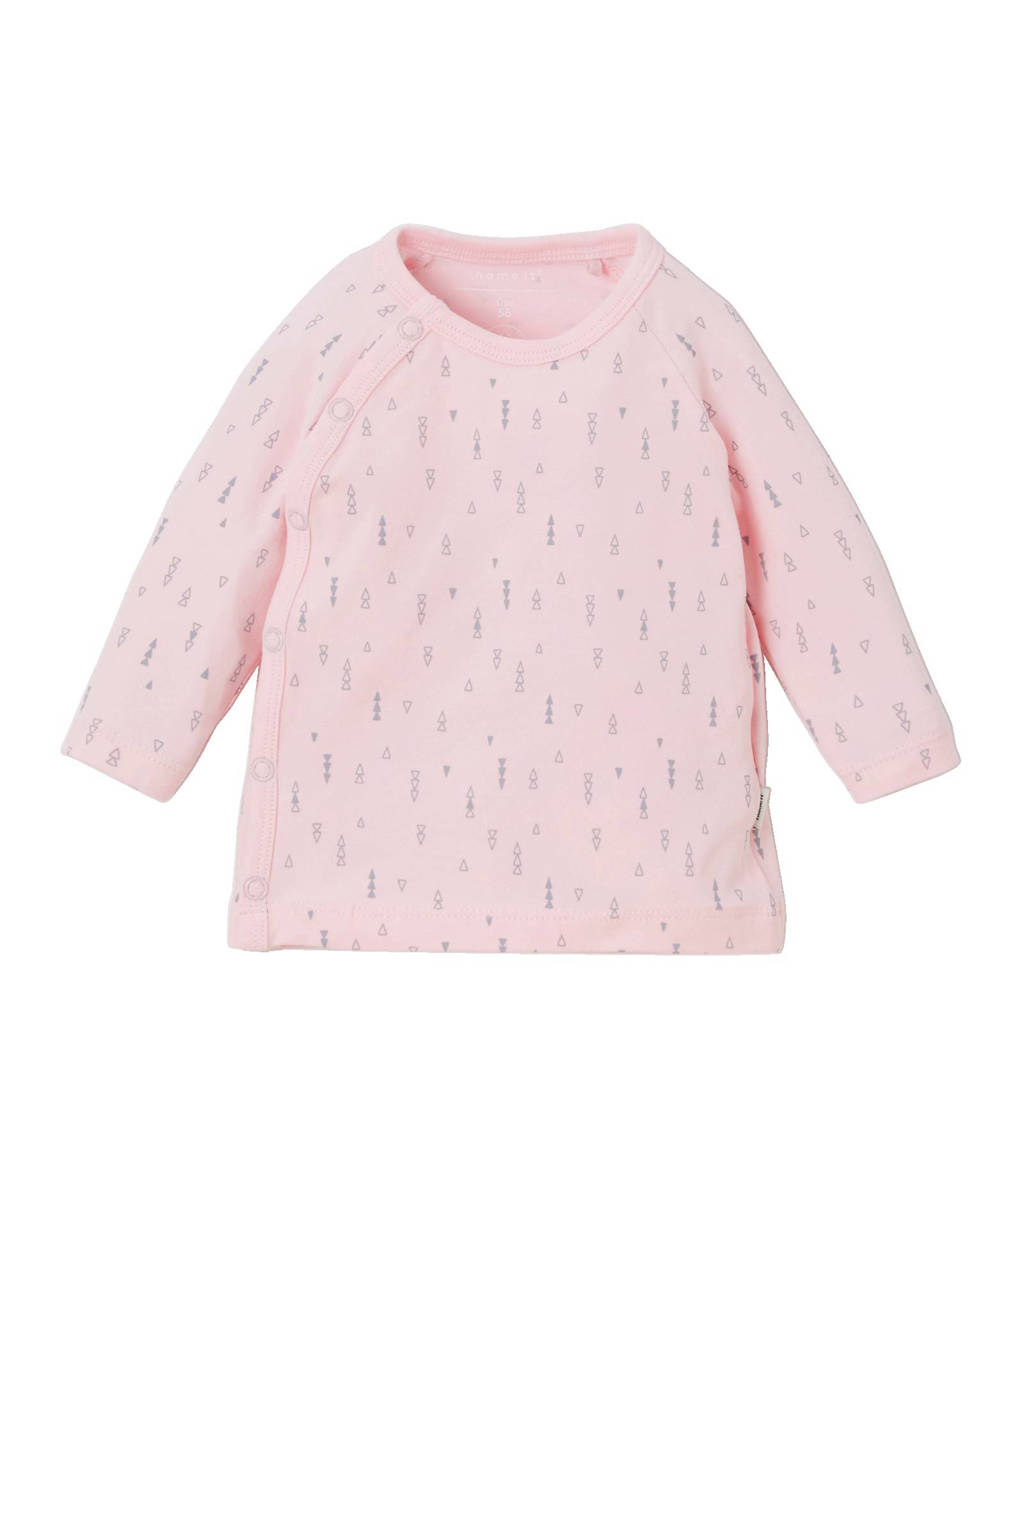 NAME IT BABY longsleeve met all over print roze, Roze